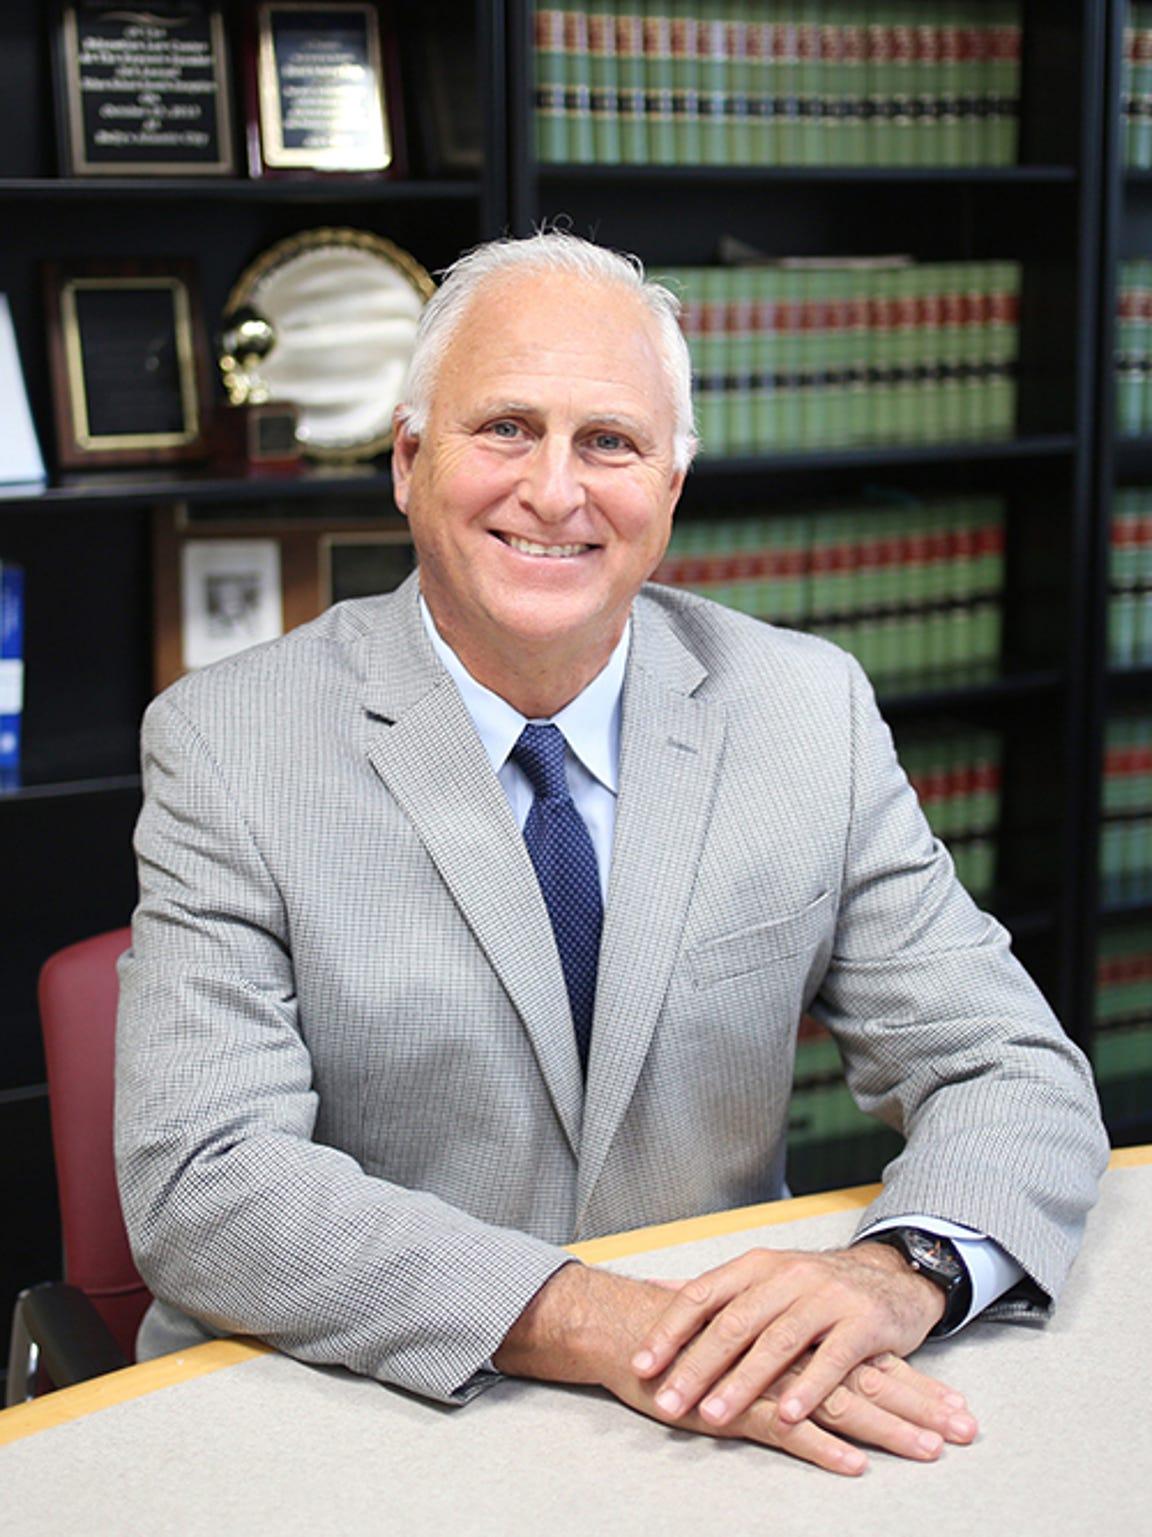 David Sciarra, executive director, Education Law Center